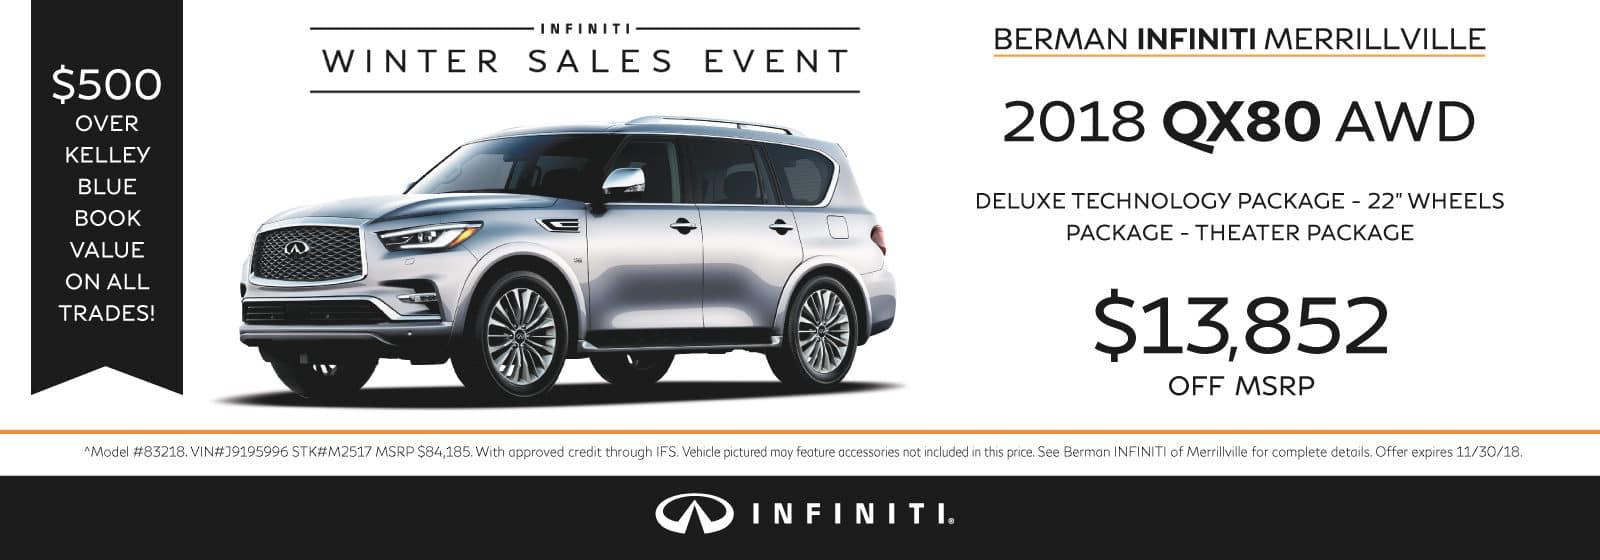 New 2018 INFINITI QX80 November Offer at Berman INFINITI of Merrillville!